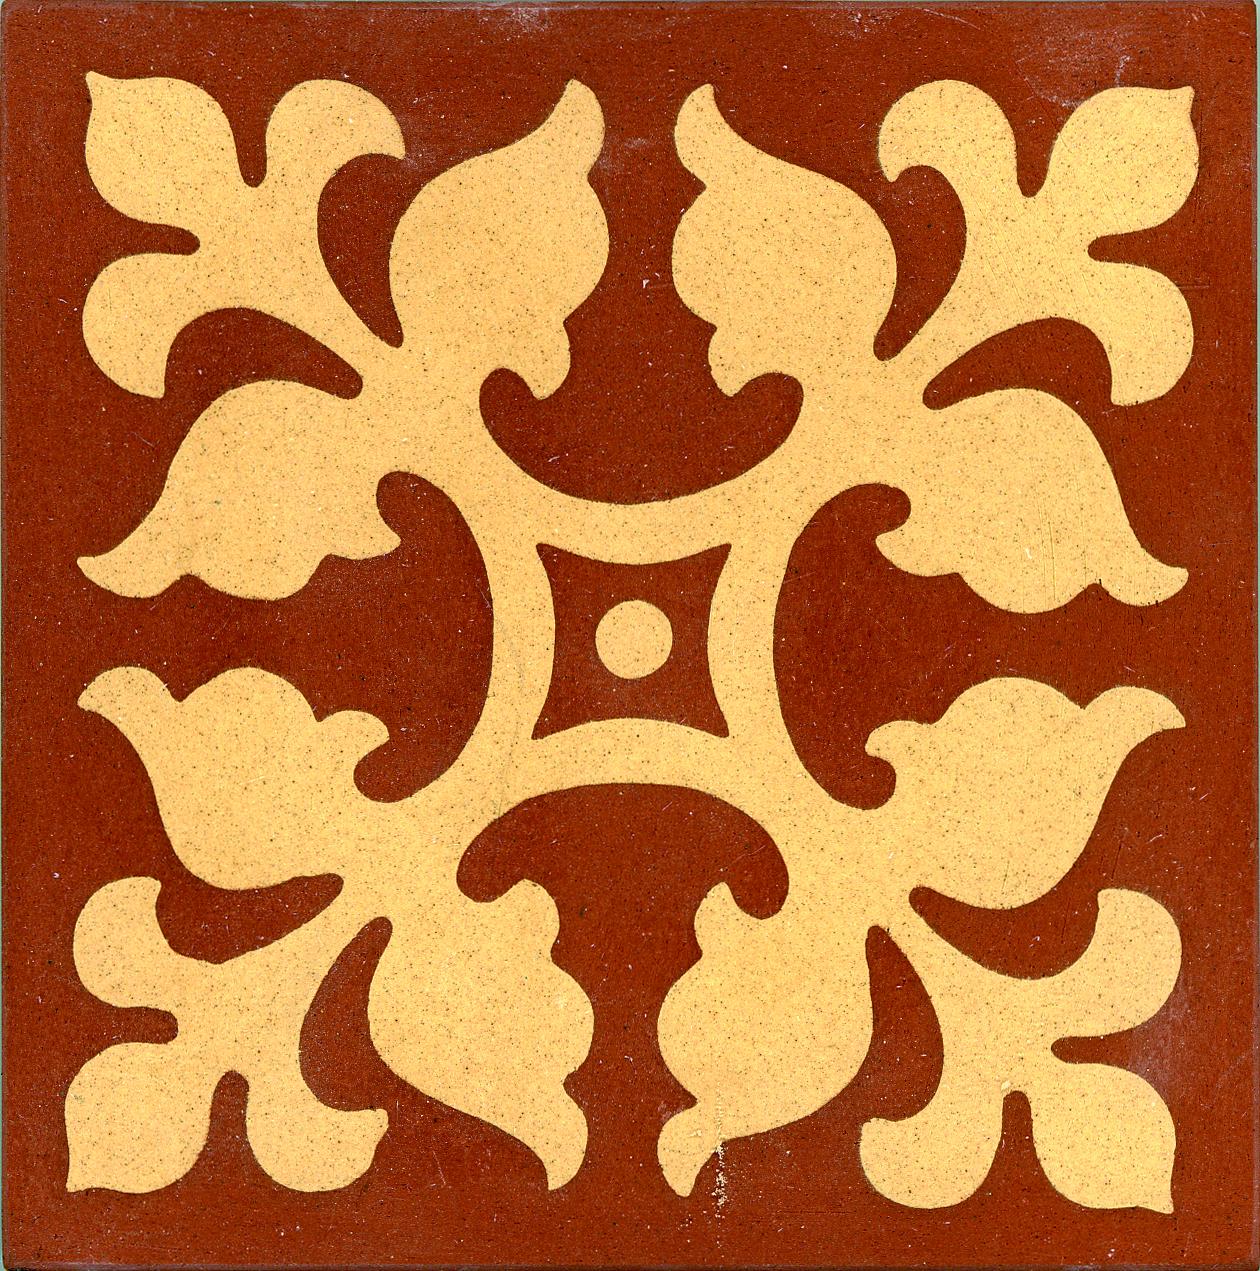 Encaustic Tile 108mmx108mm 4003.jpg